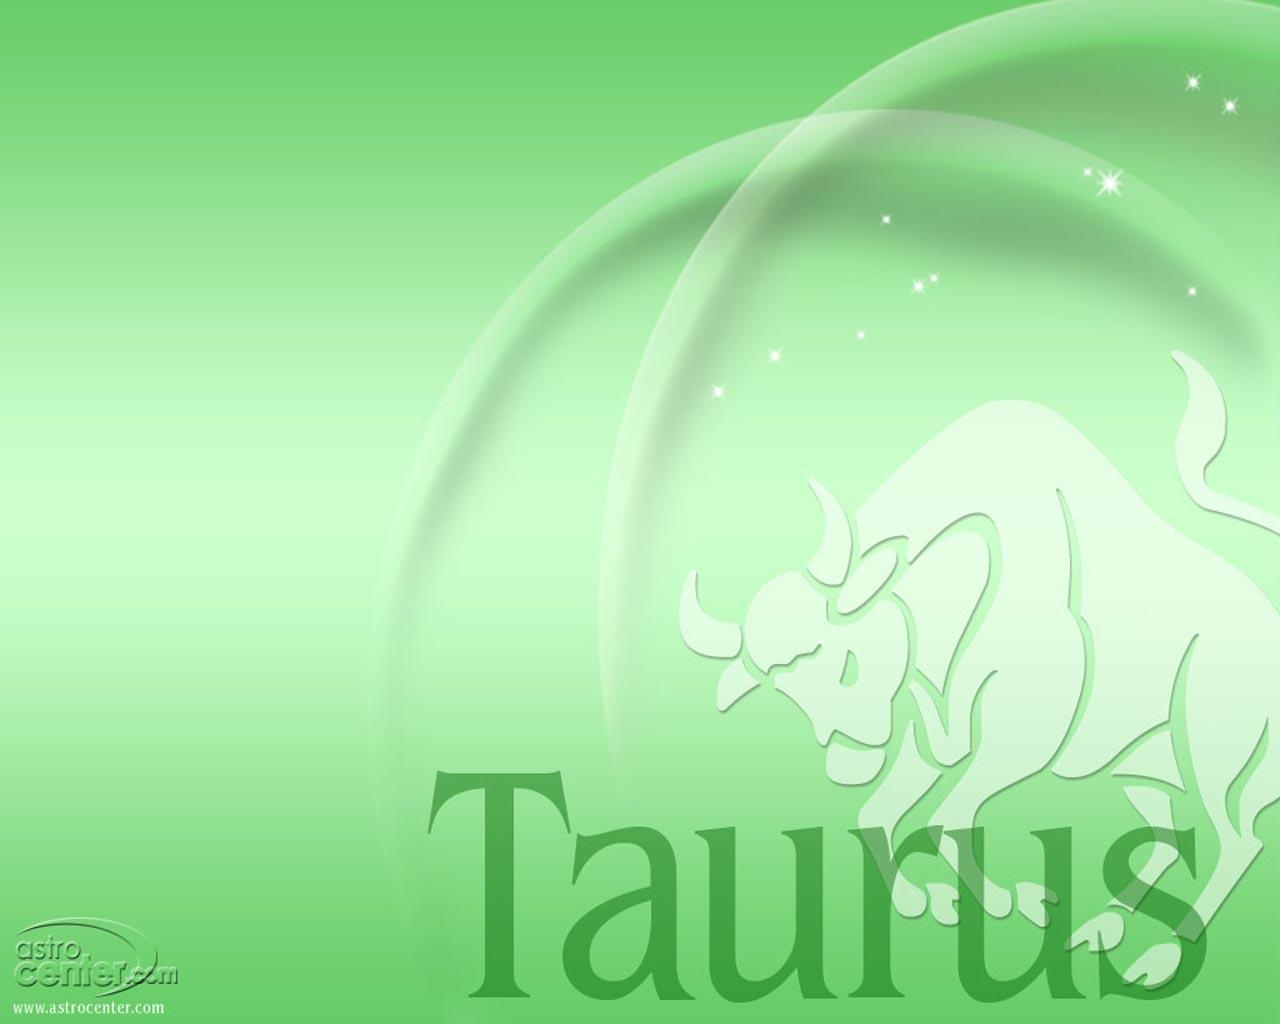 Taurus Zodiac Sign Wallpaper  WallpaperSafari